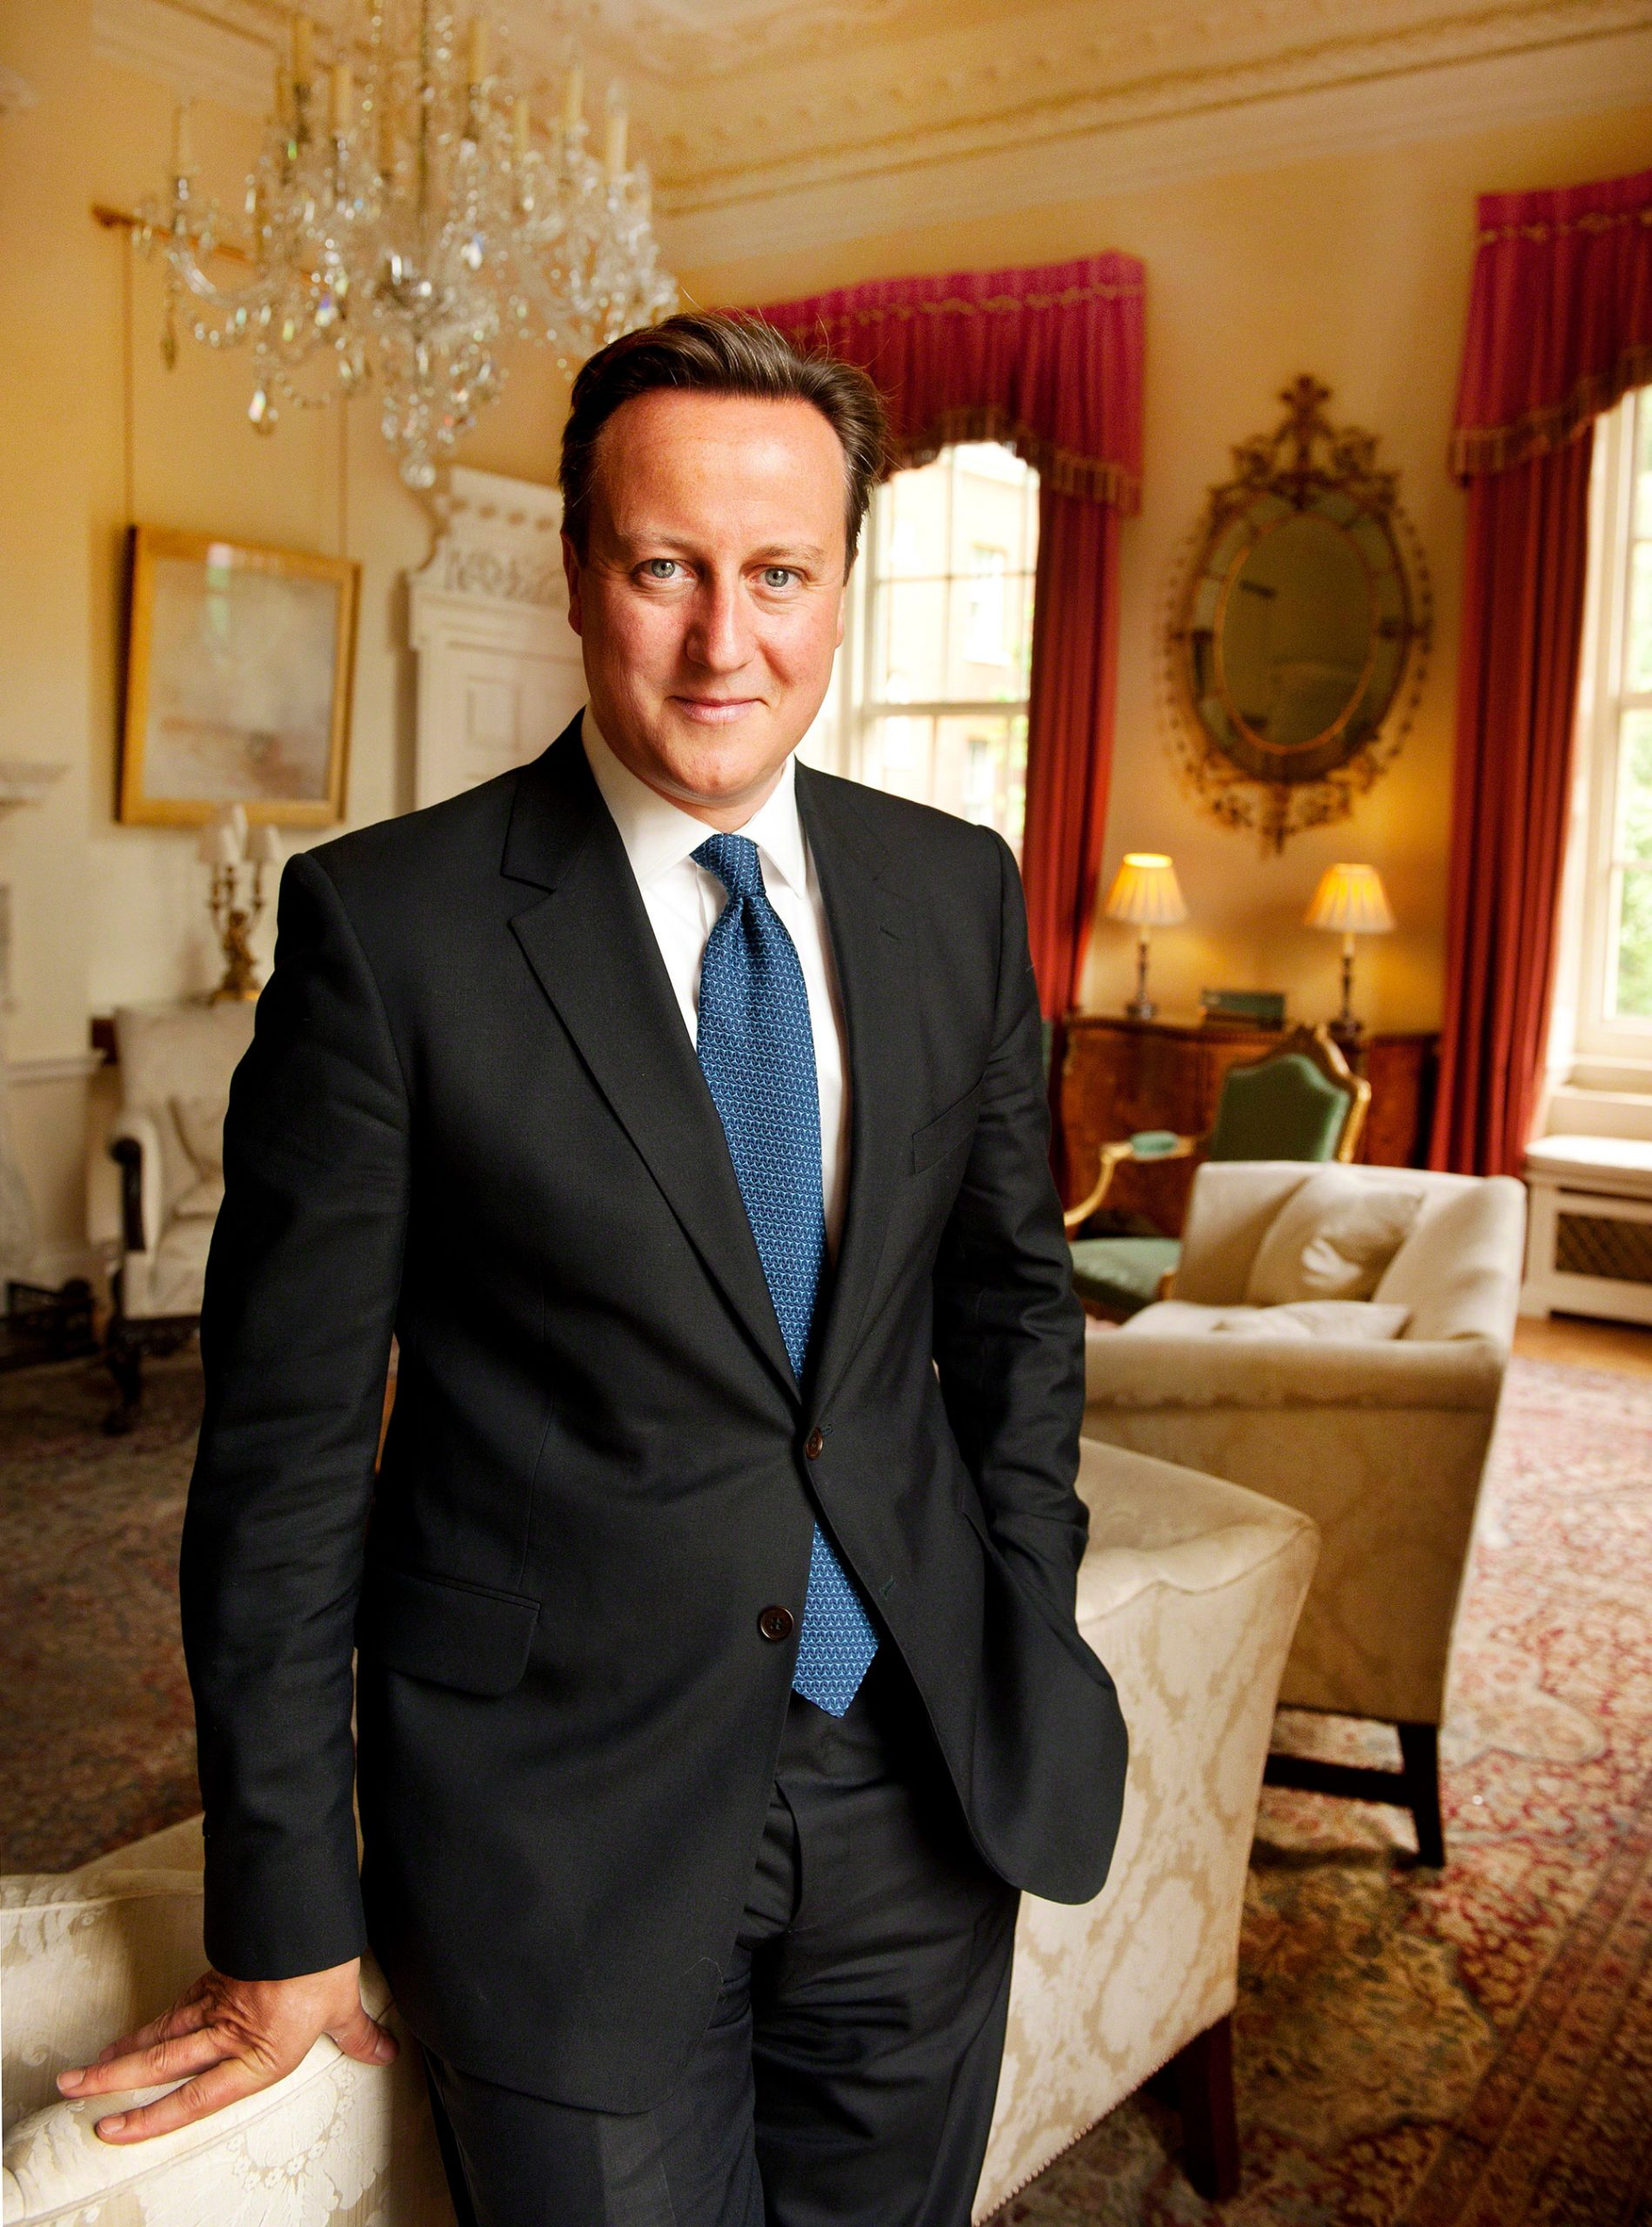 David Cameron photo